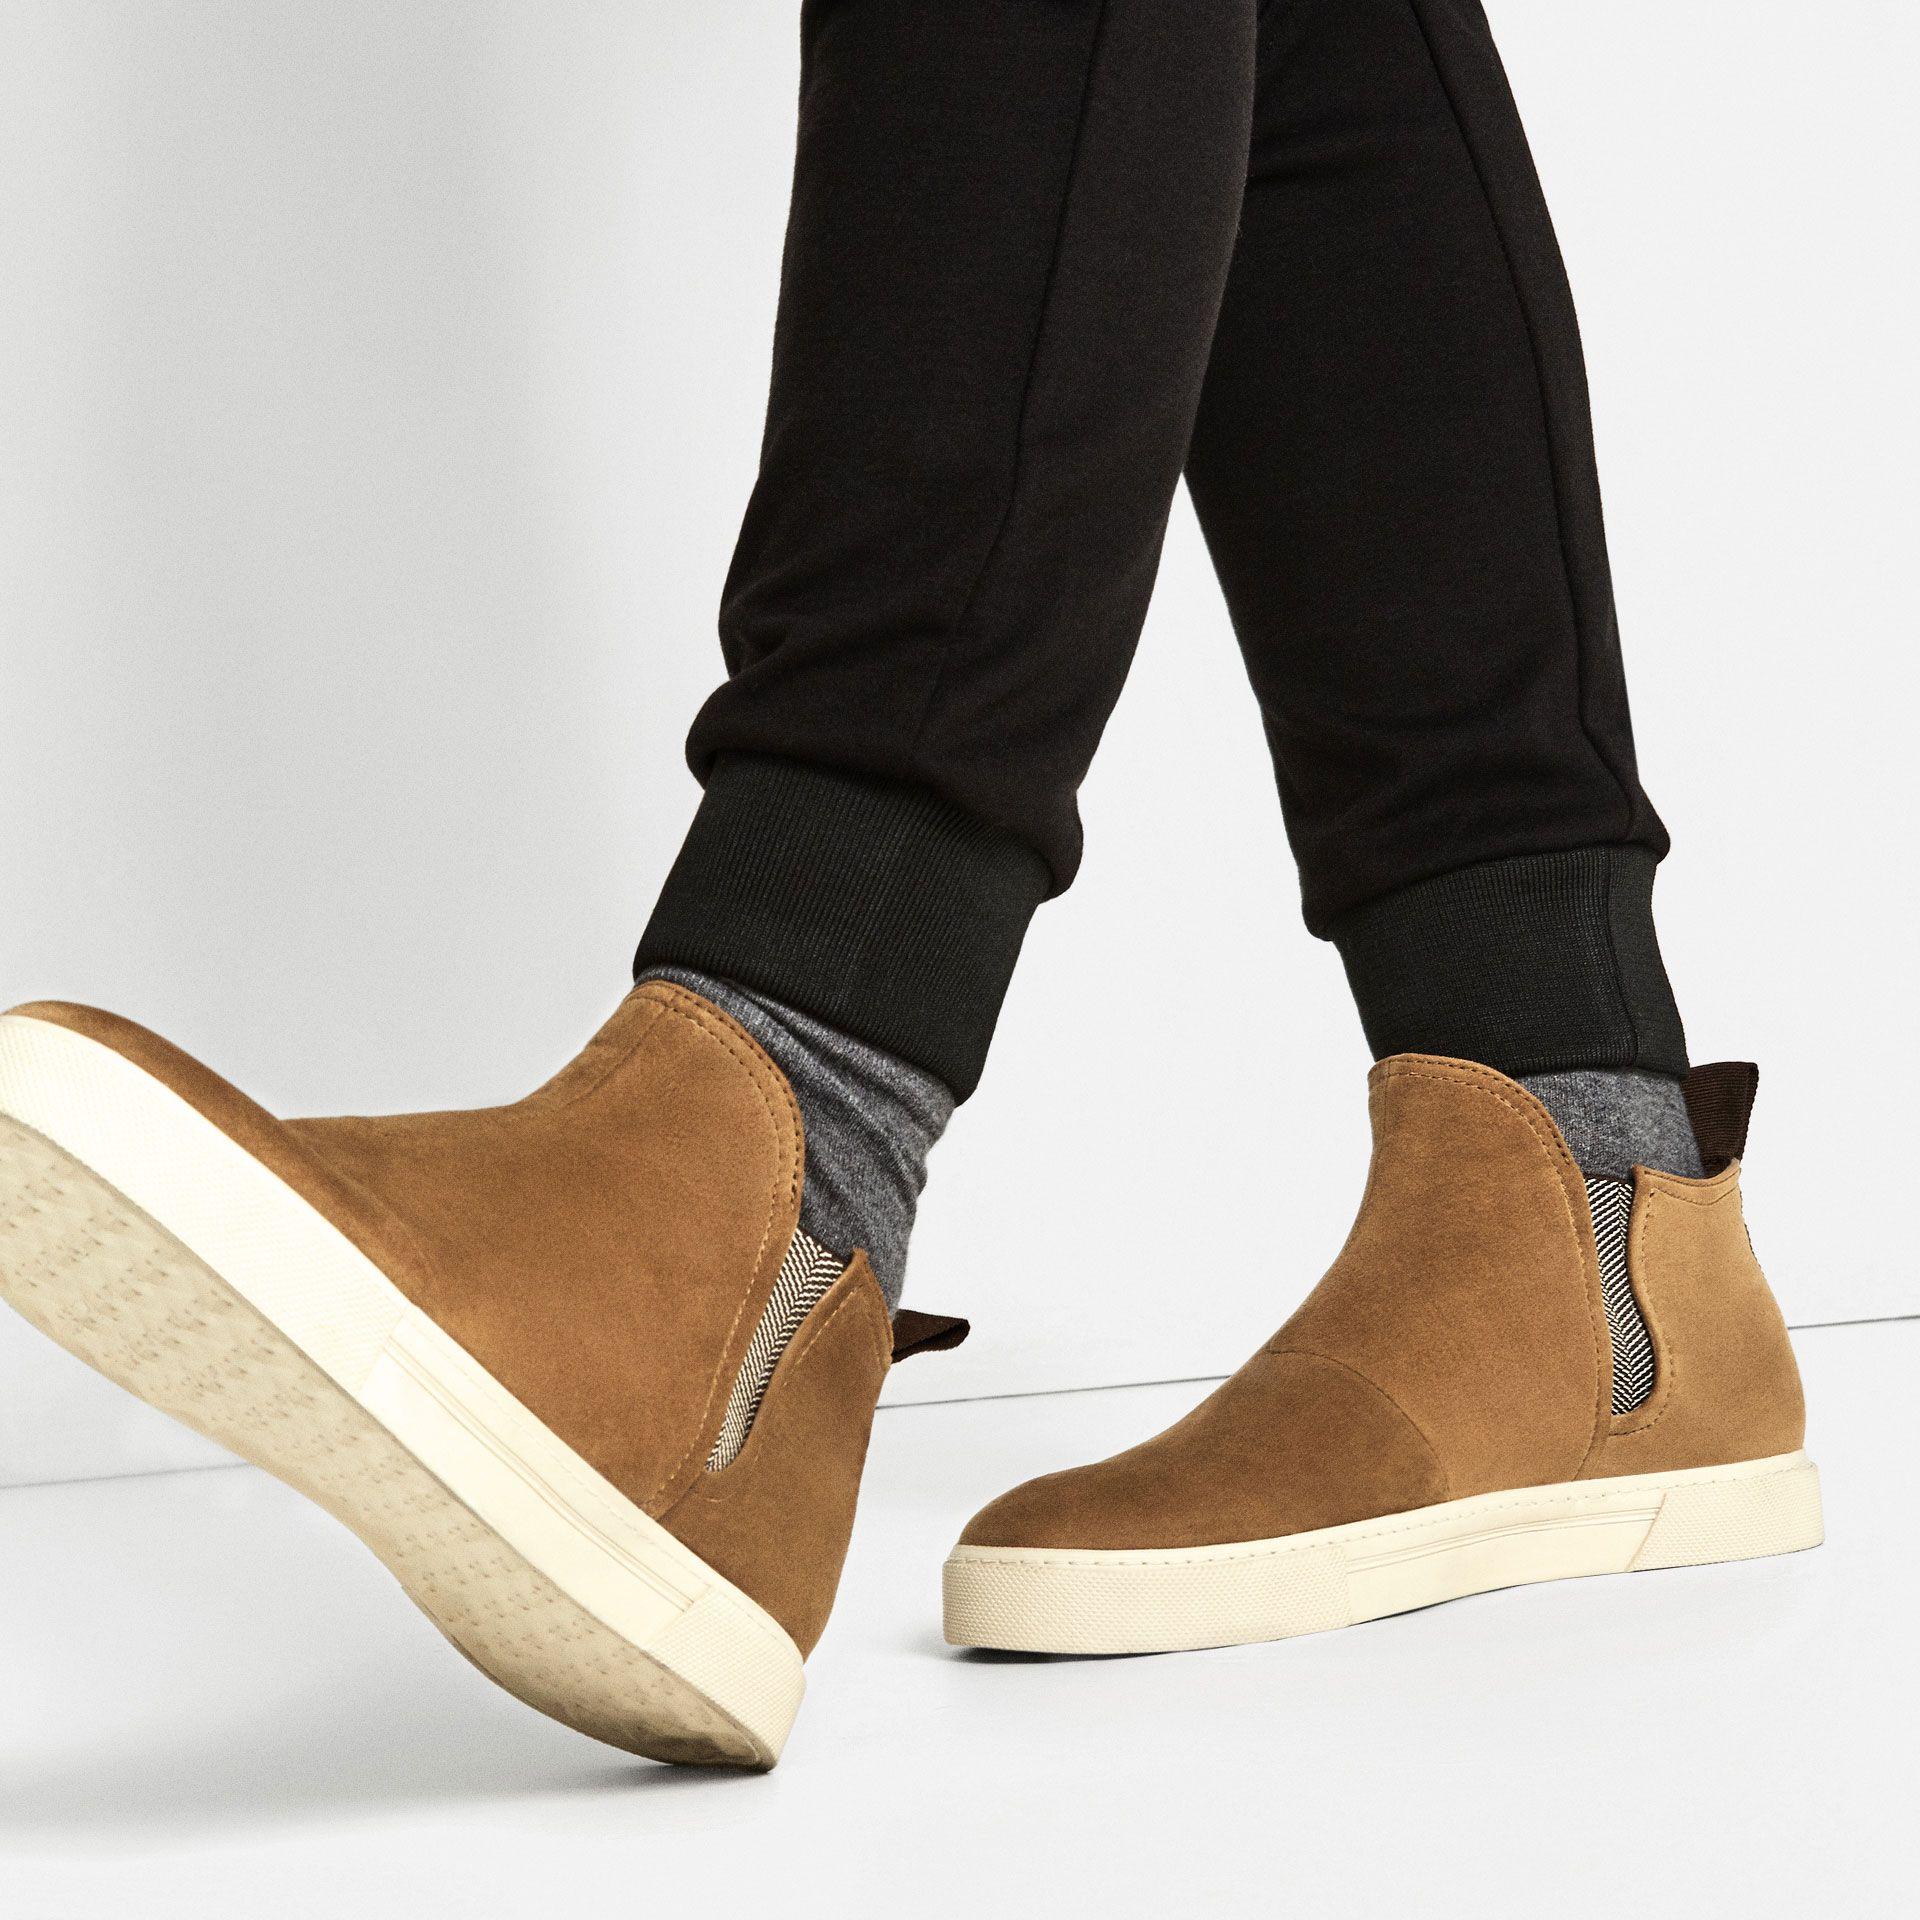 11c09647 Zapatos, botines y deportivos | Hombre | ZARA España | calzados ...